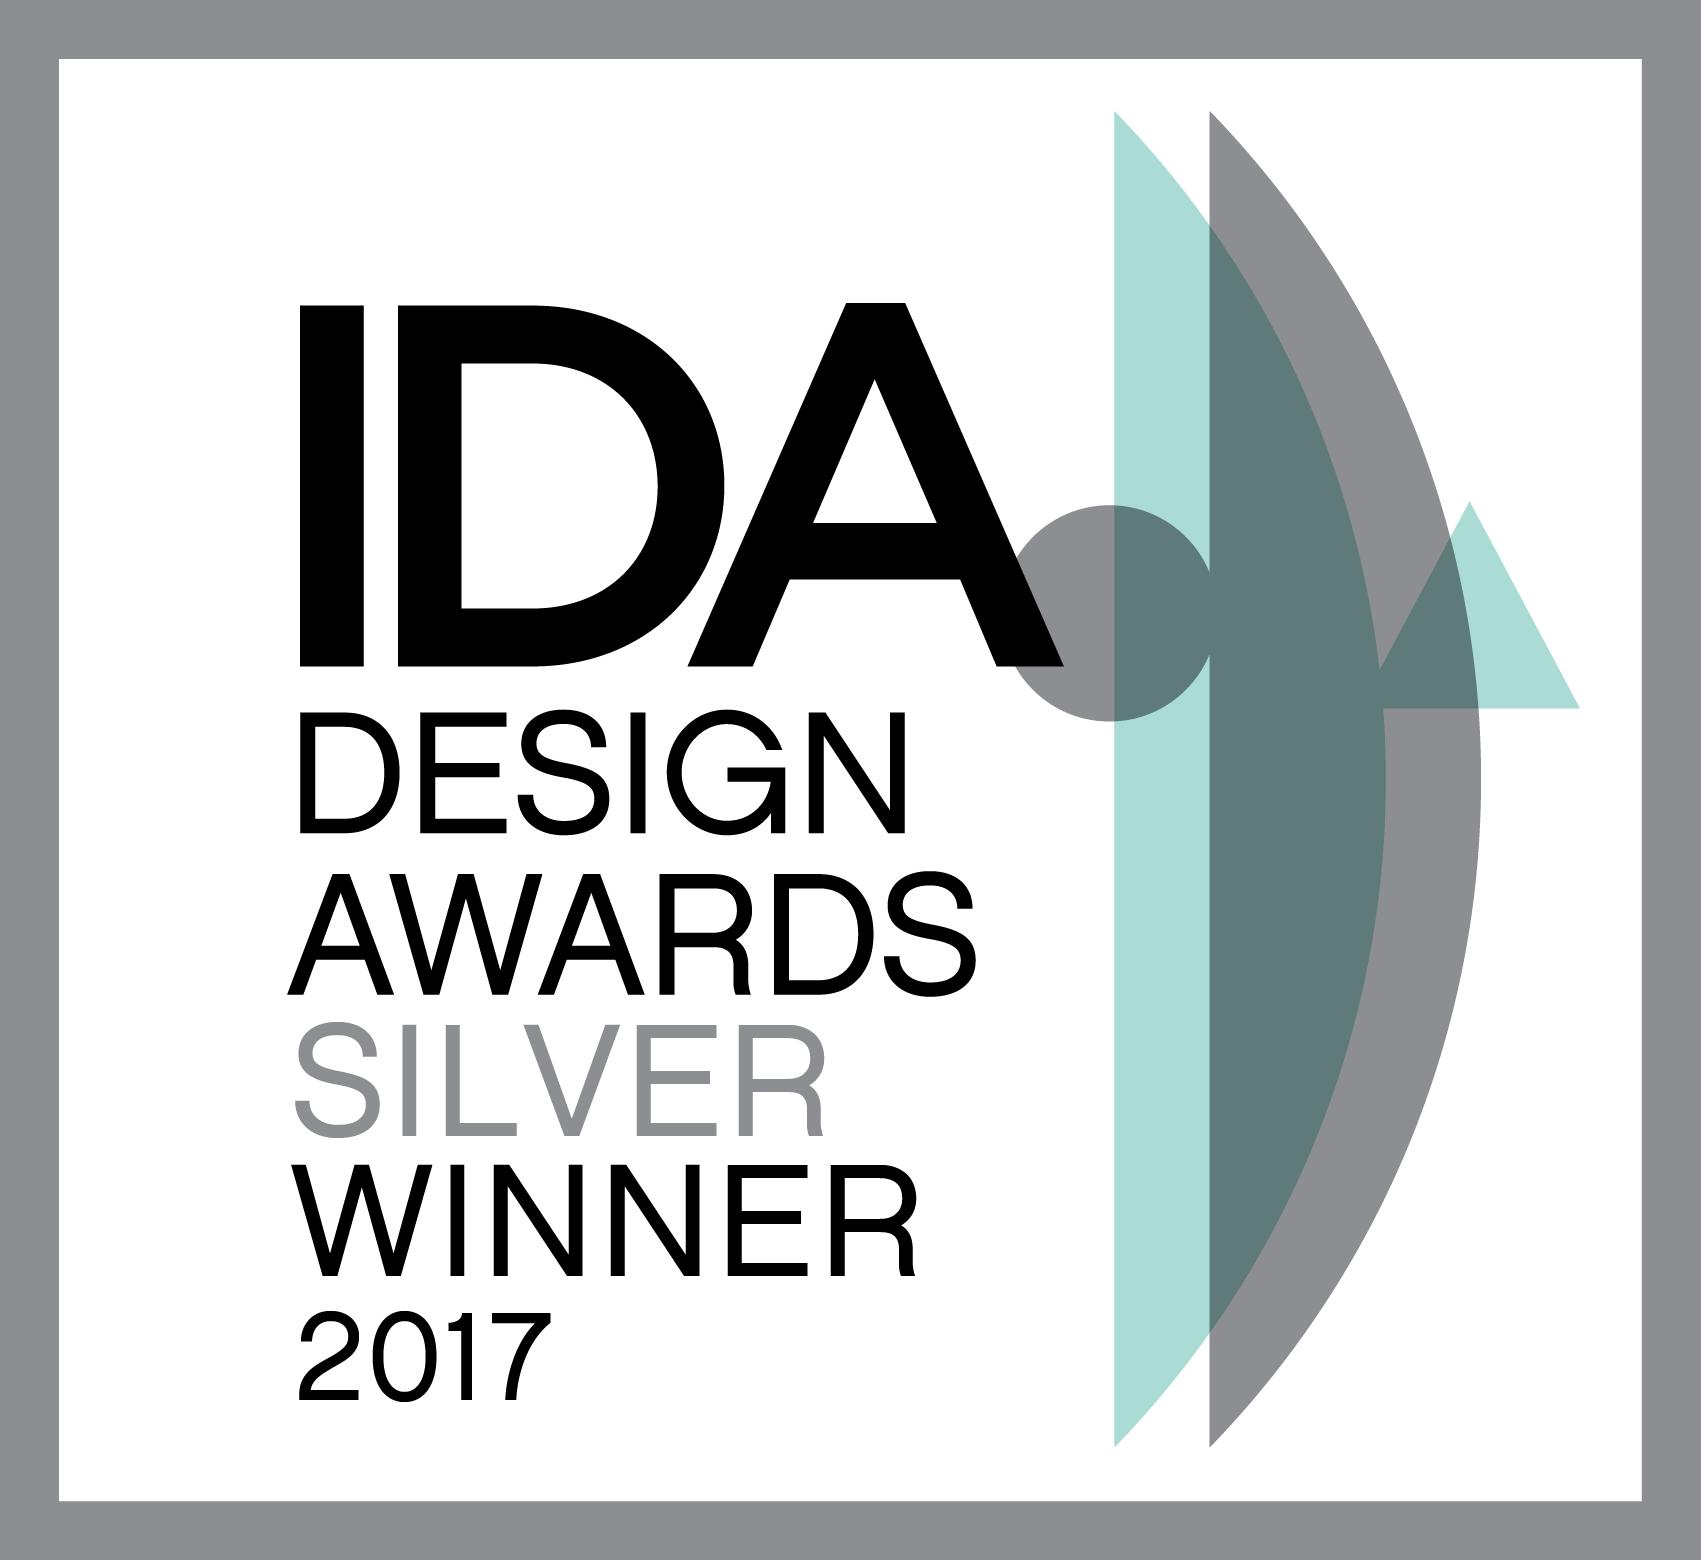 International Design Awards 2017 Silver